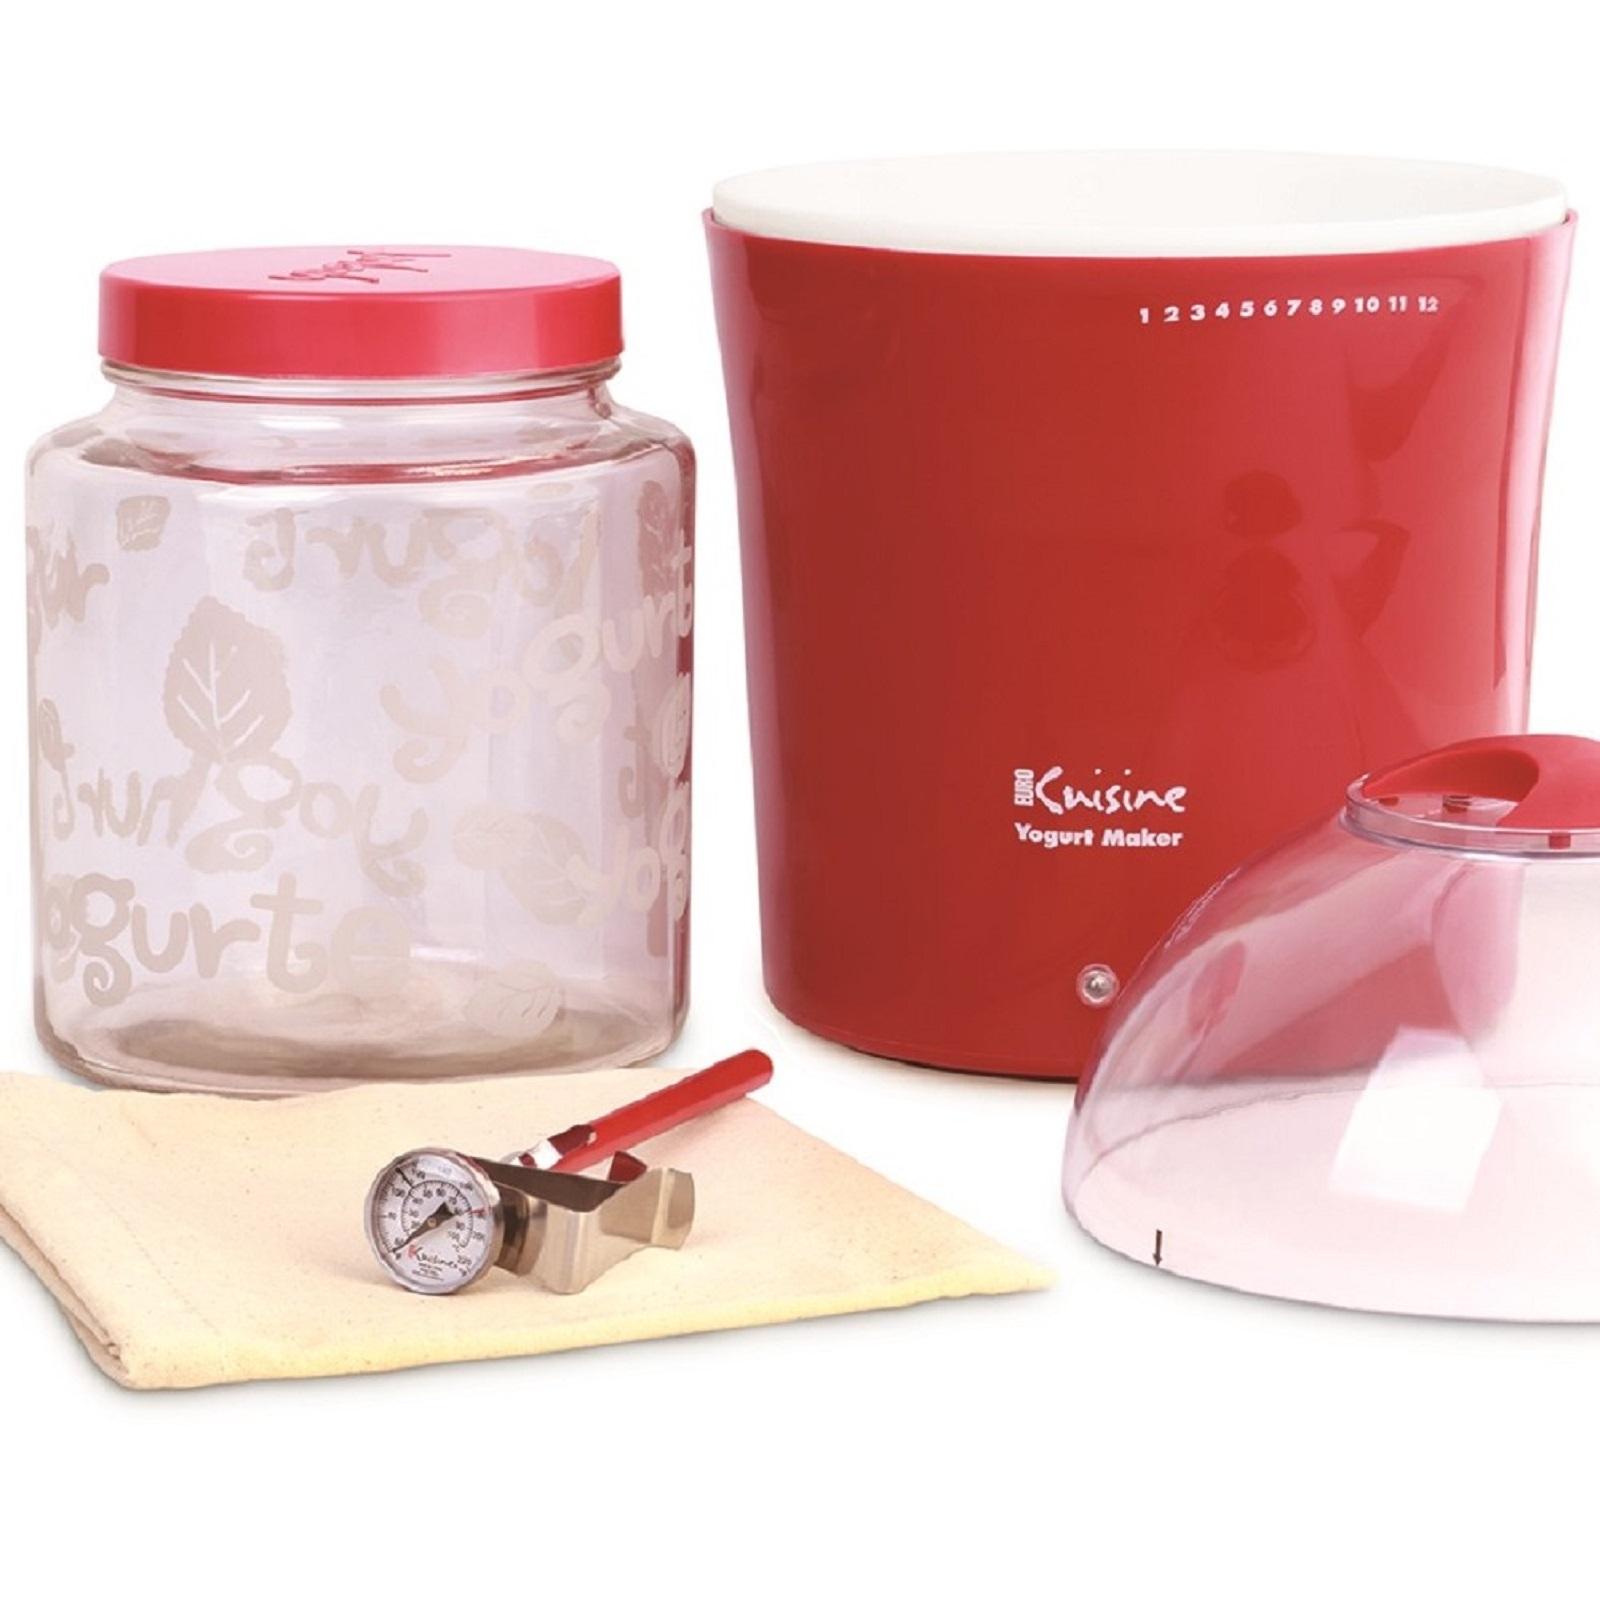 Euro Cuisine YM460 2Qt Yogurt & Greek Yogurt Maker With Glass Jar (Red) PartNumber: 00821707000P KsnValue: 4655074 MfgPartNumber: YM460